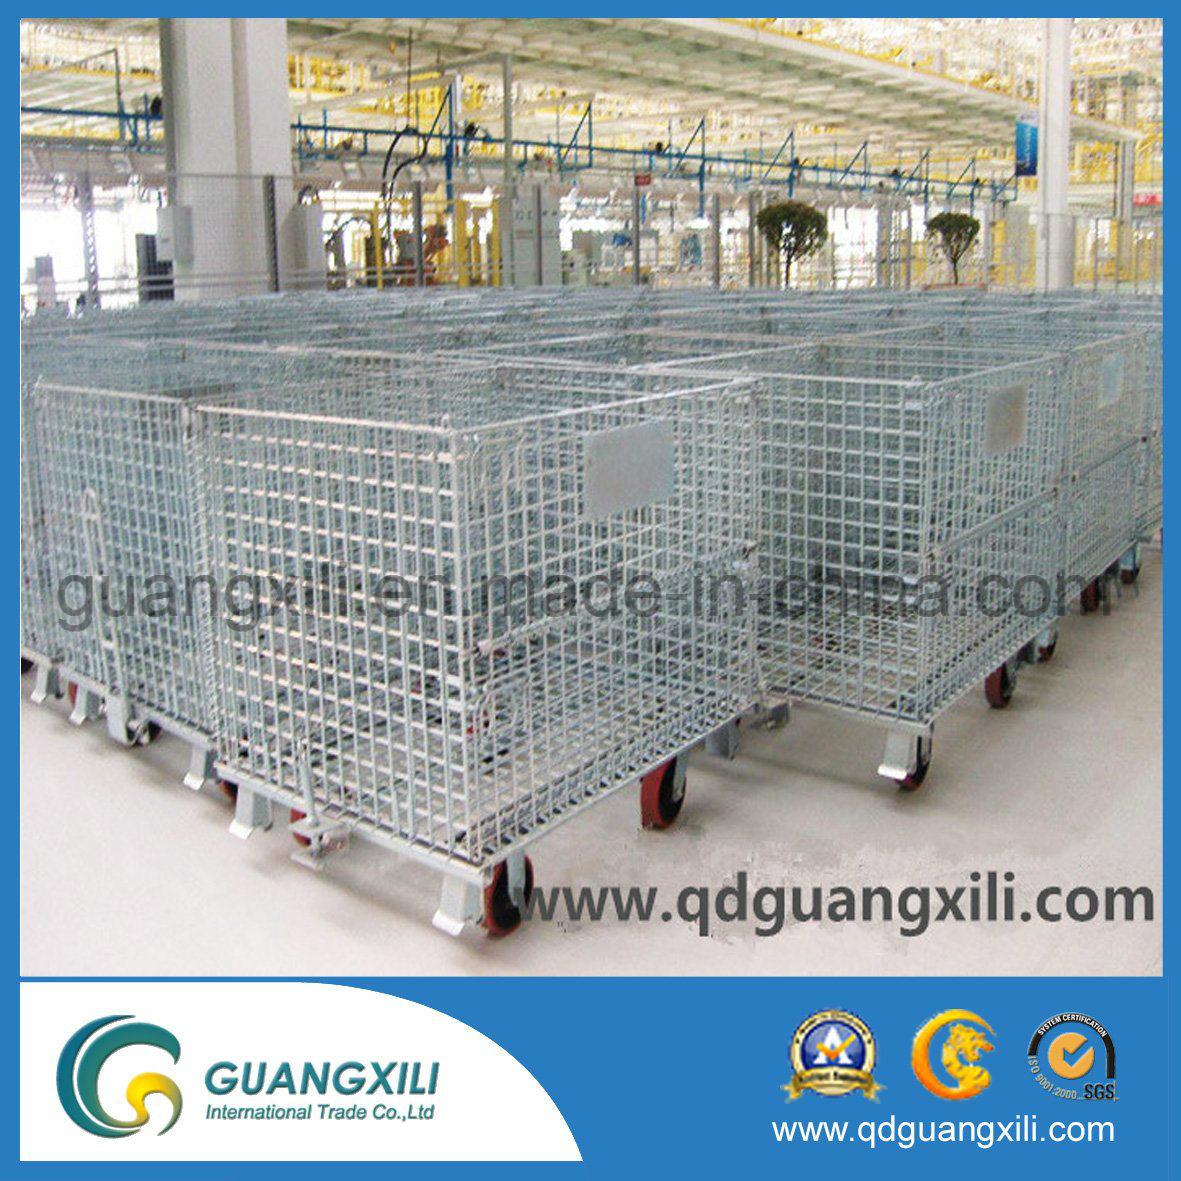 Workshop Standard Storage Cage with Cap in Warehouse